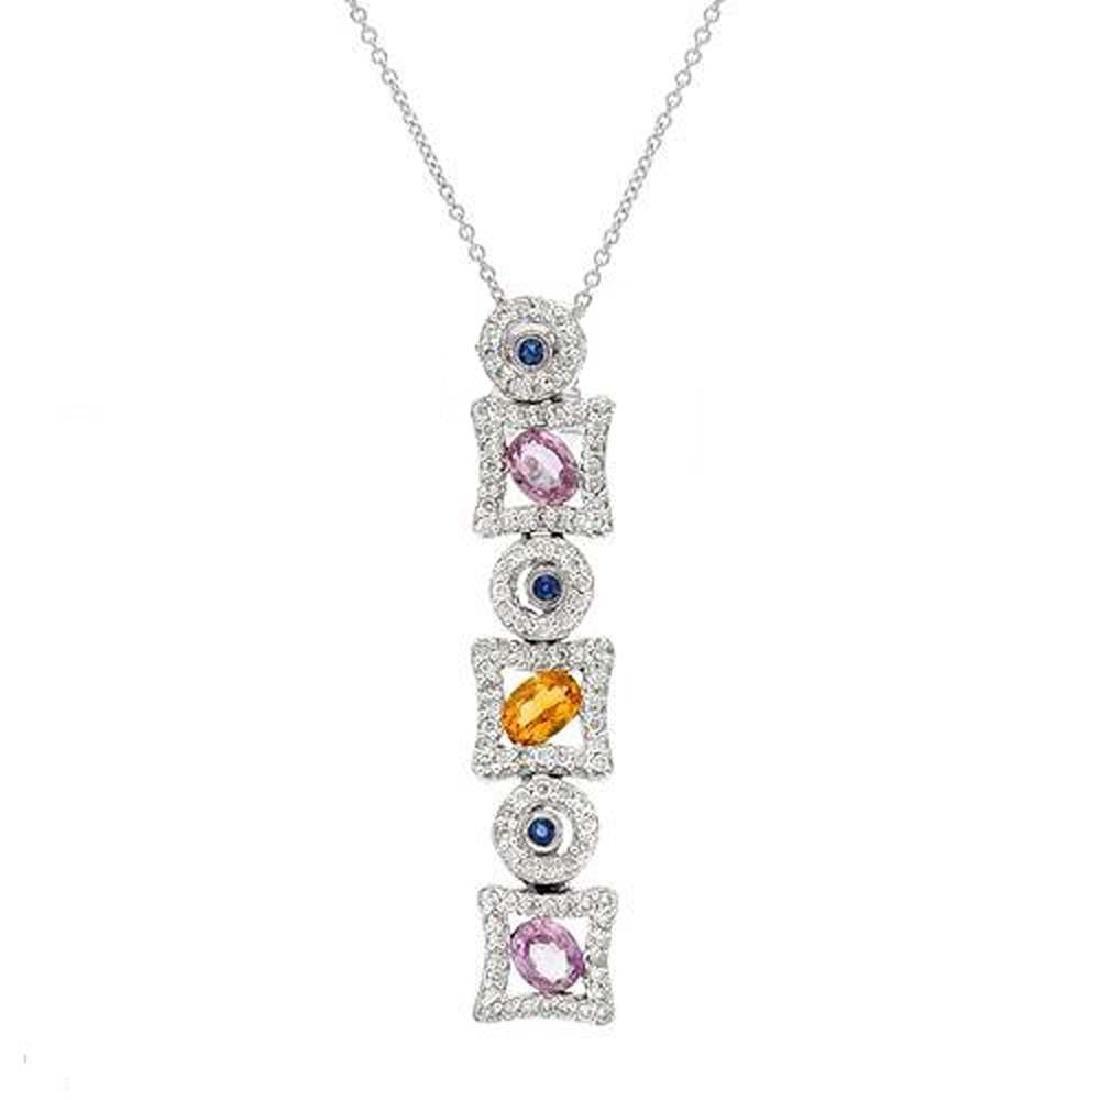 Genuine 1.9 TCW 14K White Gold Ladies Necklace